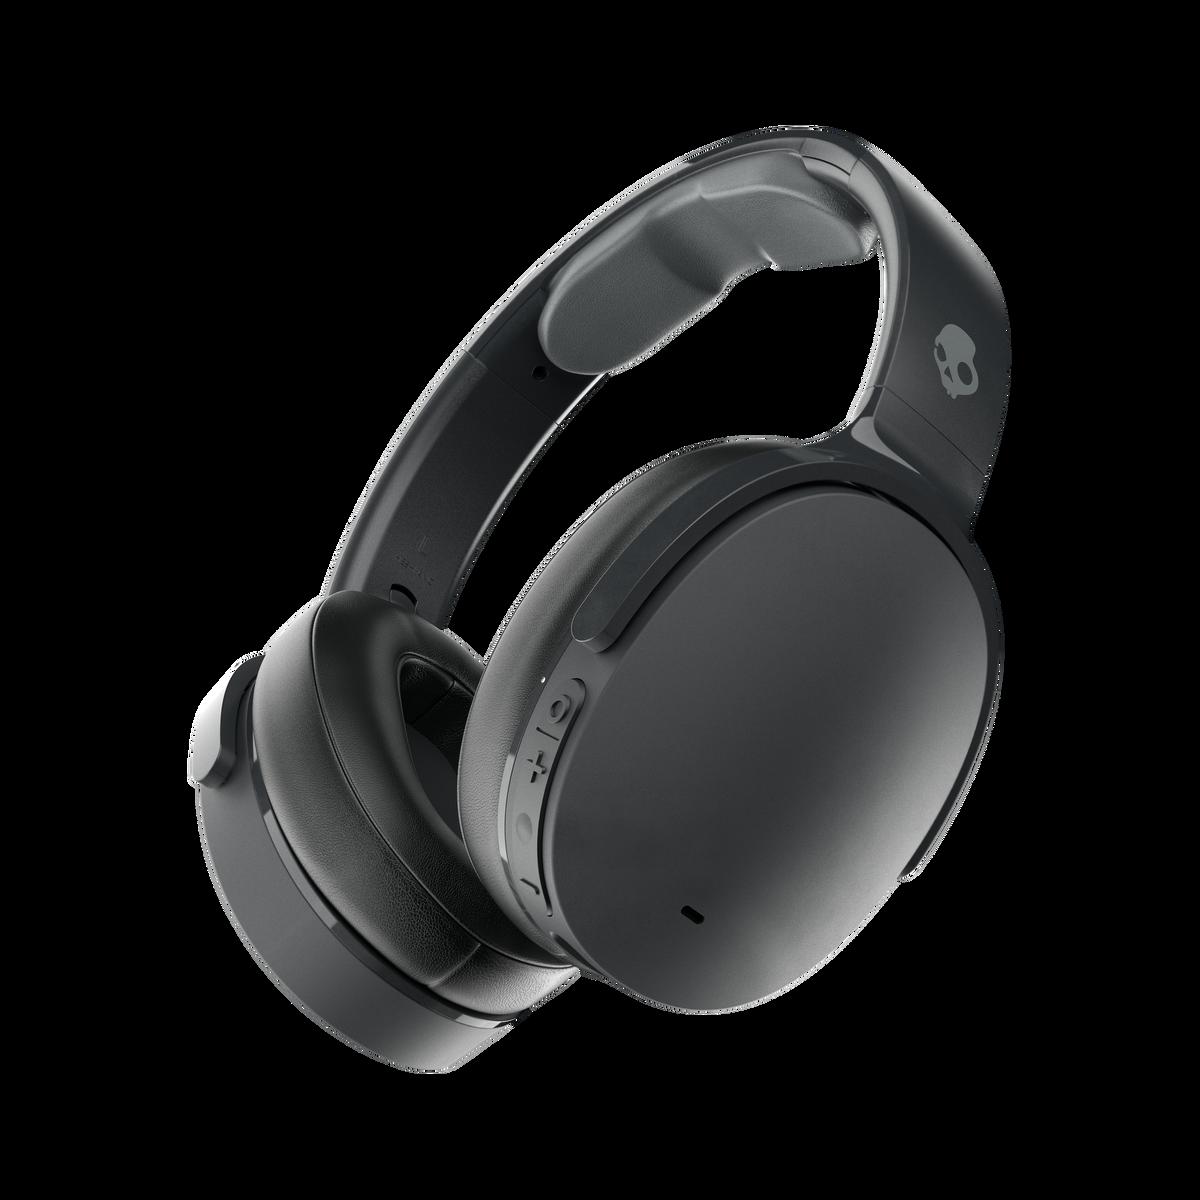 Així són els auriculars Hesh ANC, de Skullcandy